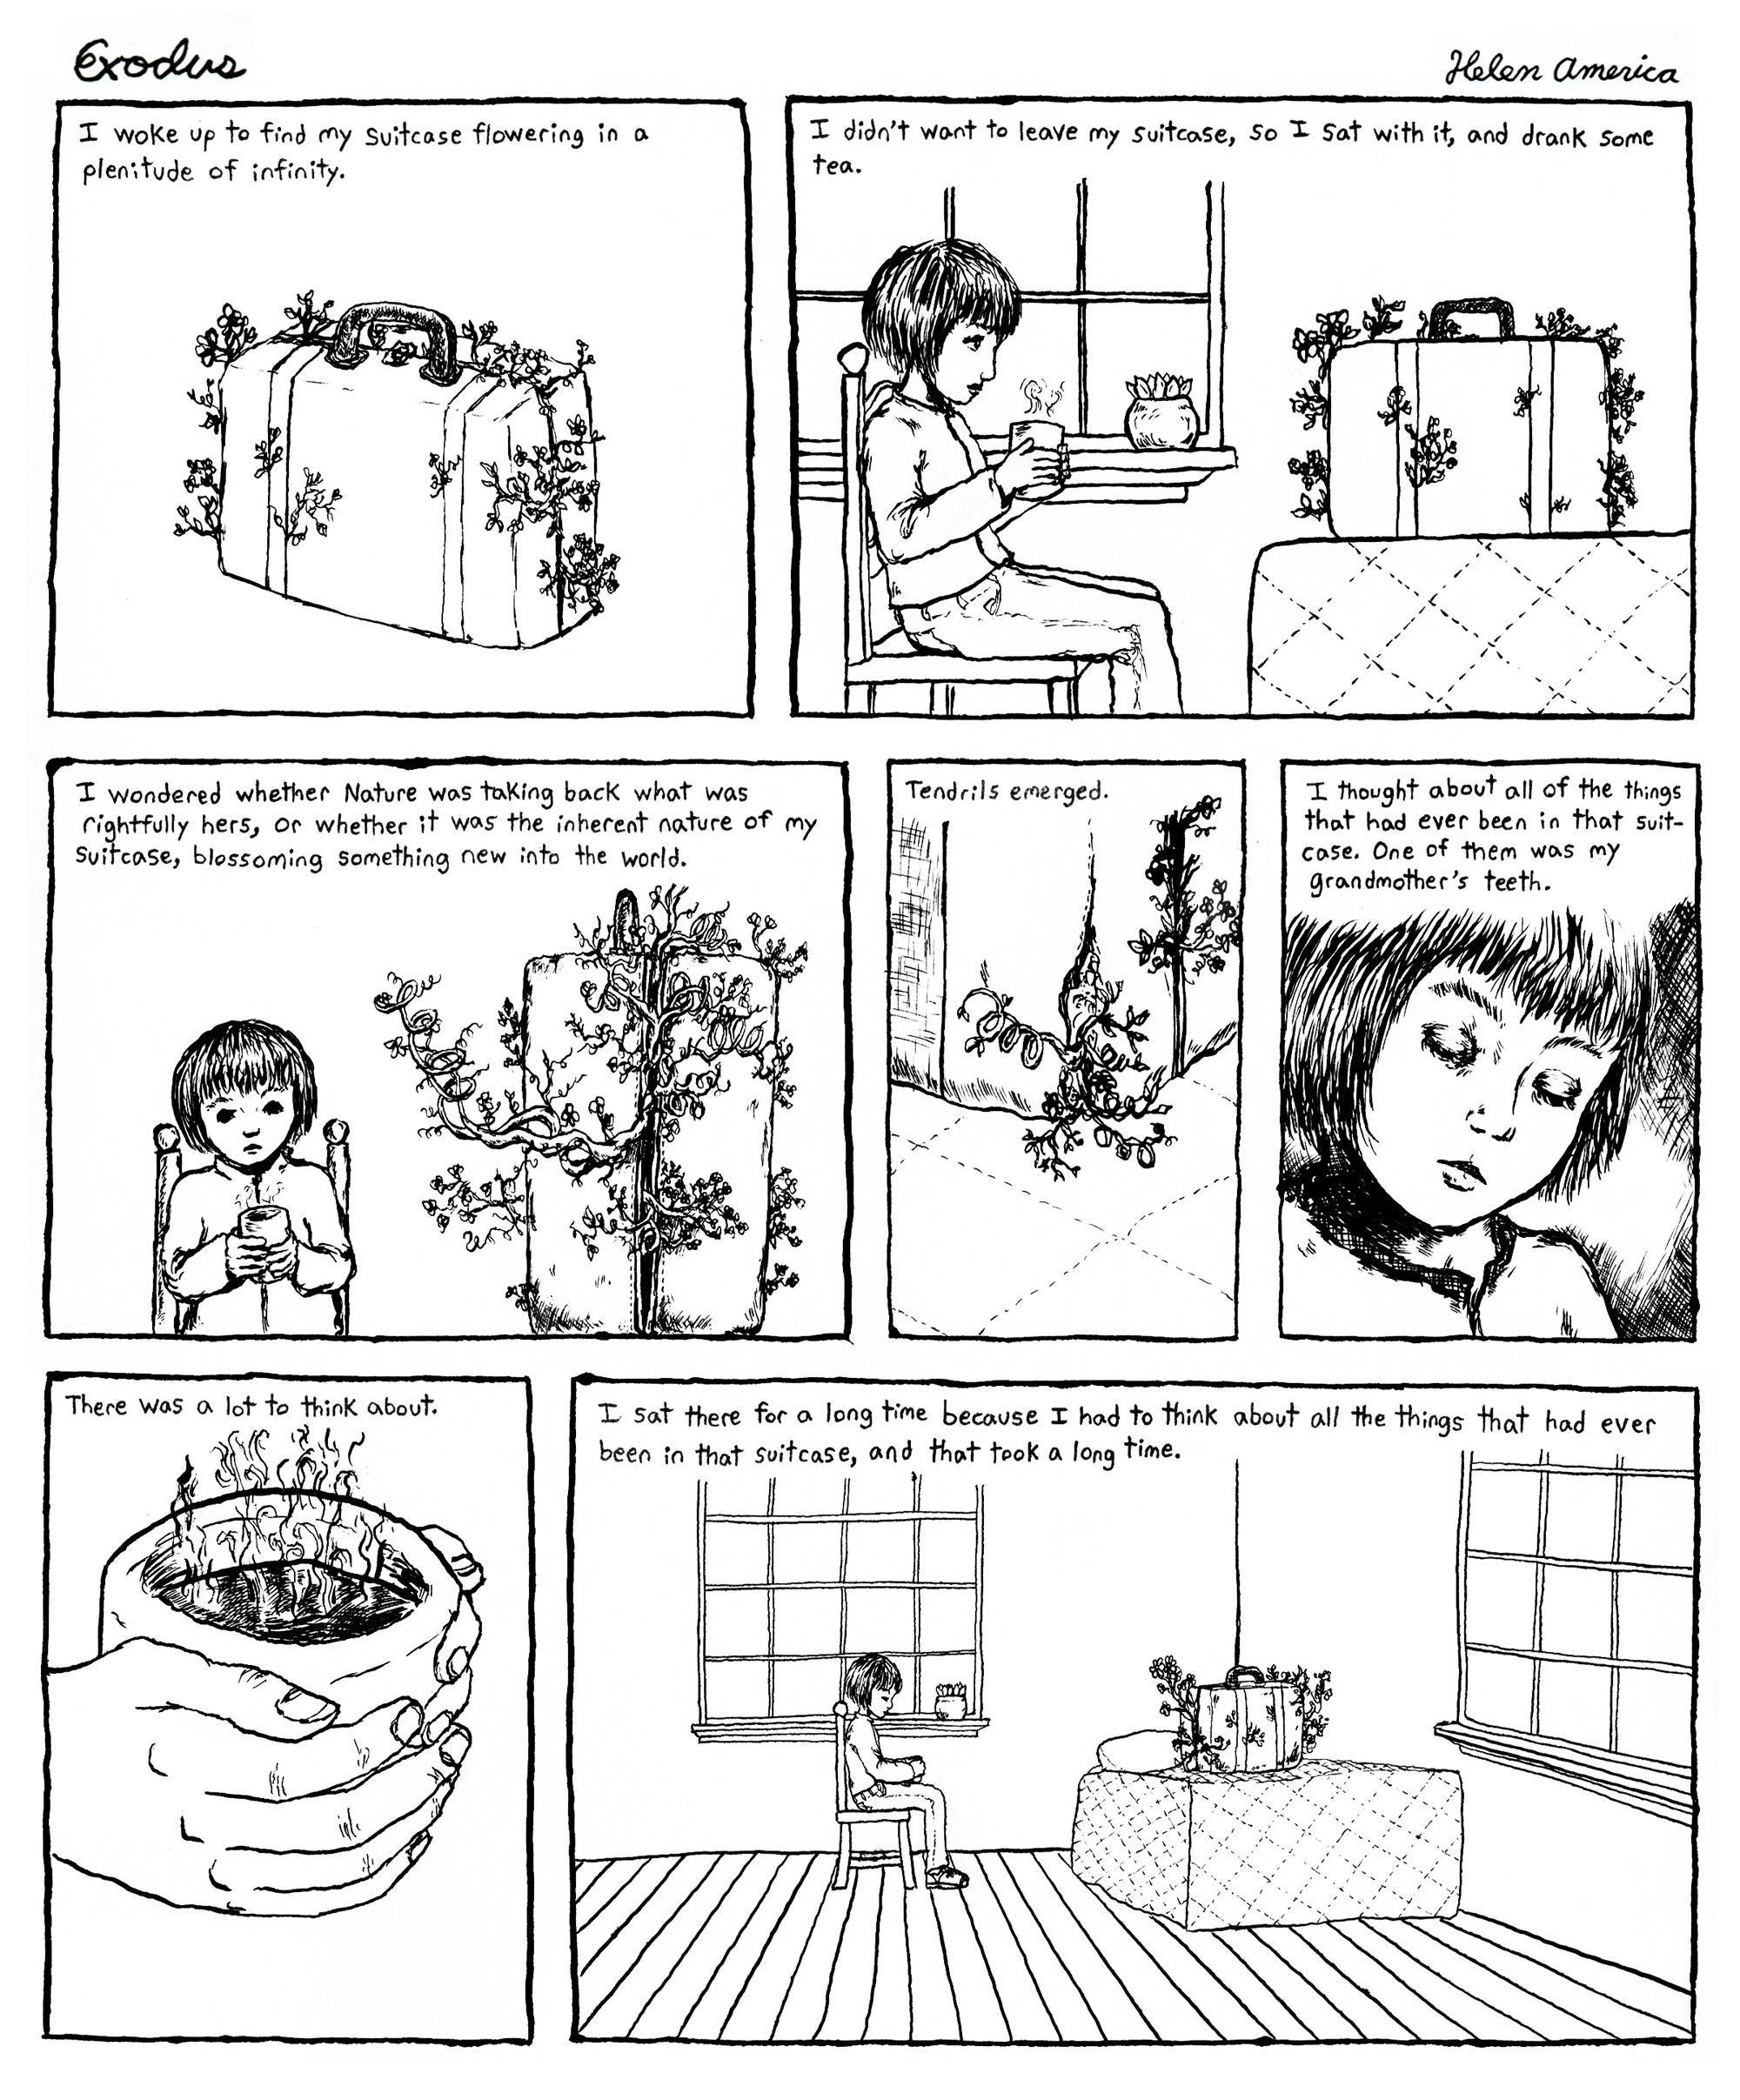 Exodus Page 1